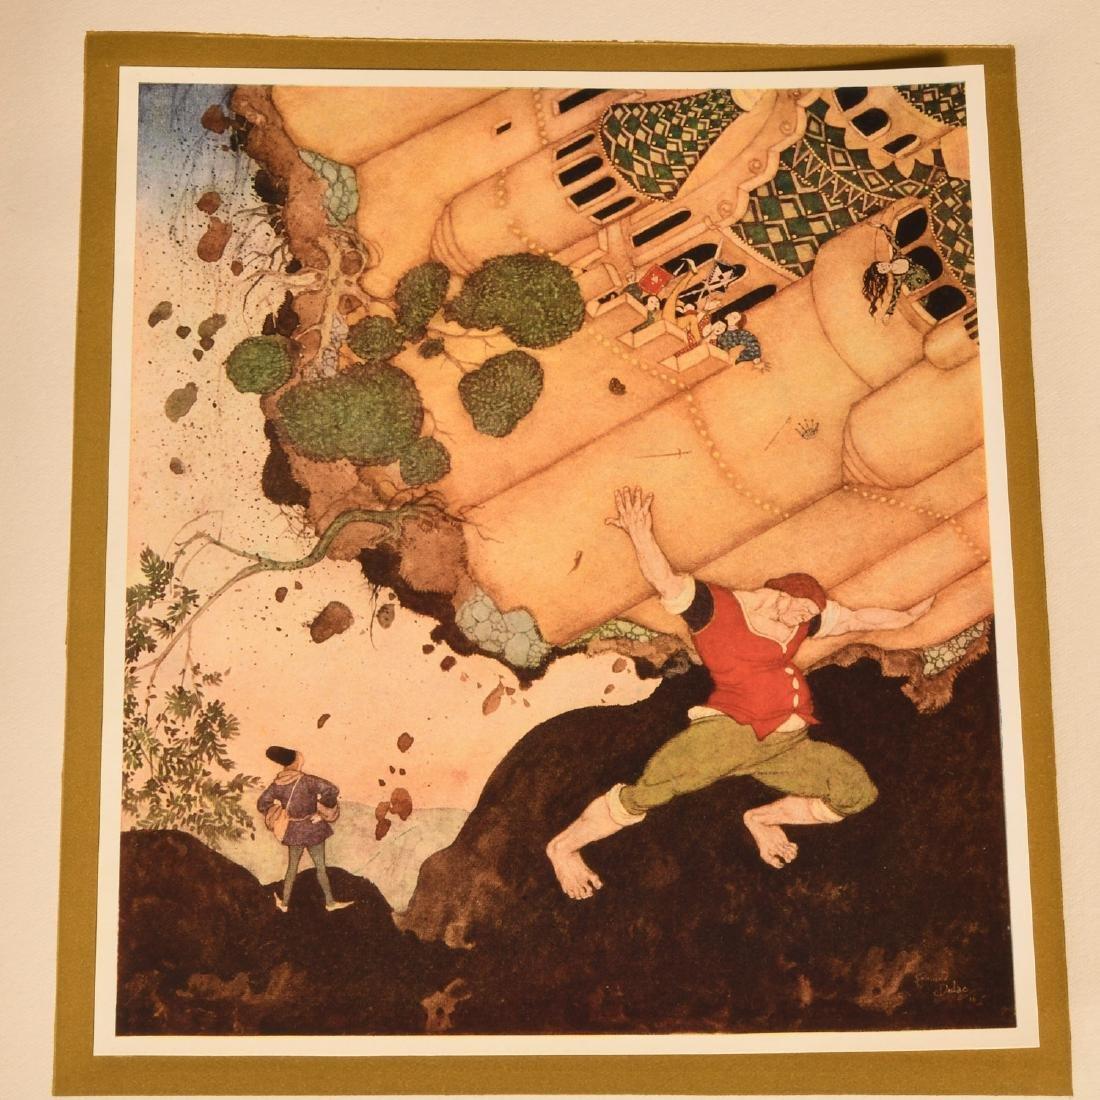 BOOKS: Edmund Dulac's Fairy-Book 1916 - 8